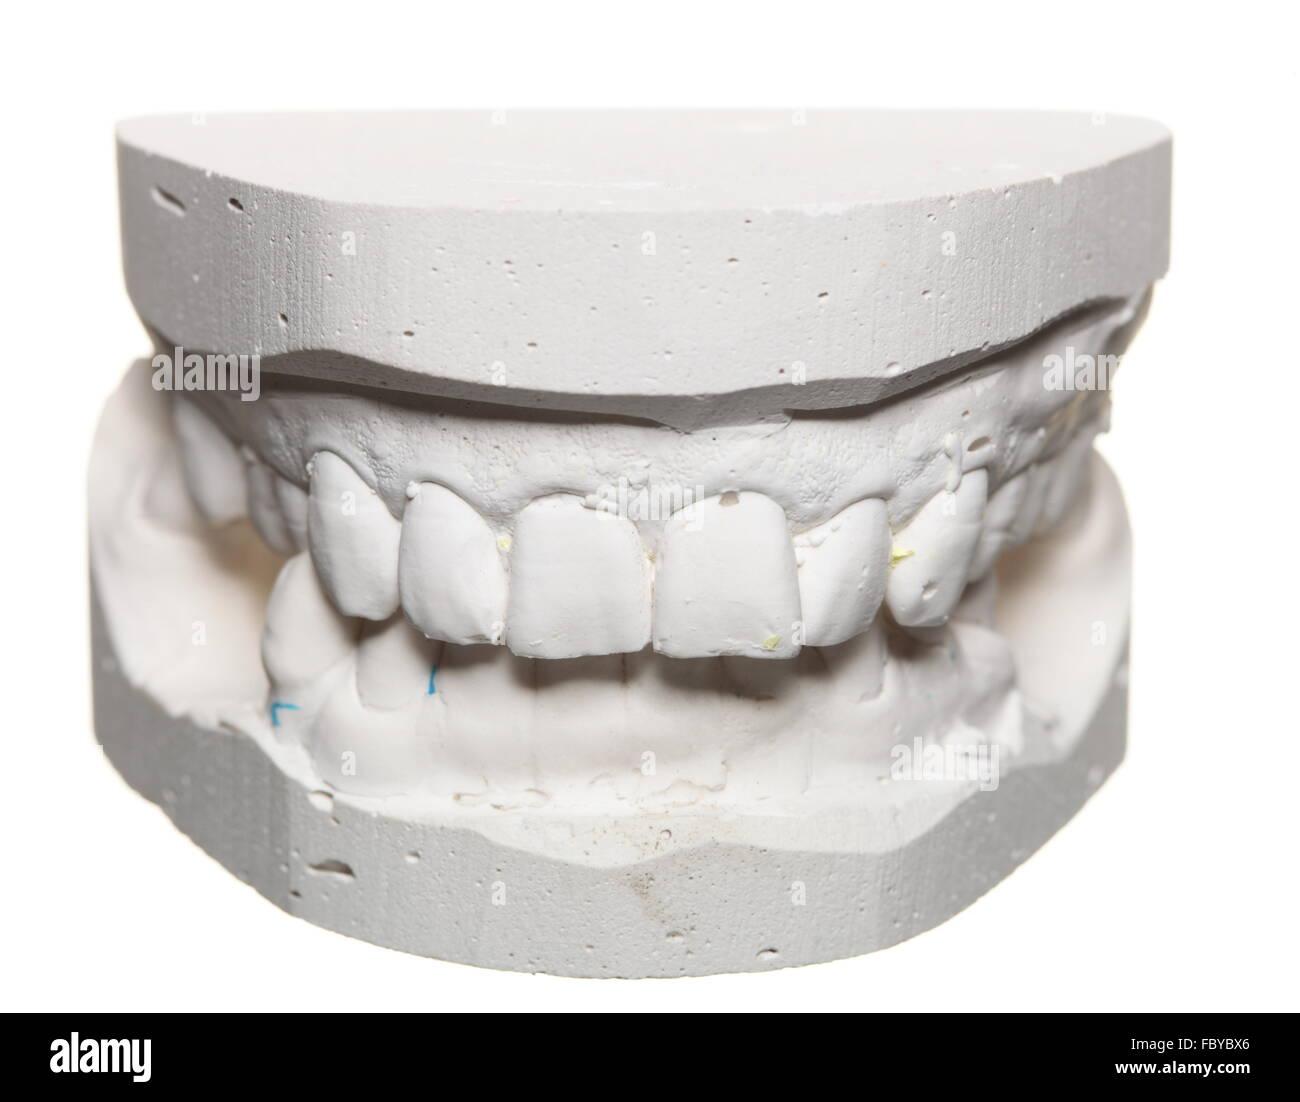 Dental Gypsum Plaster : Dental gypsum model mould of teeth in plaster stock photo